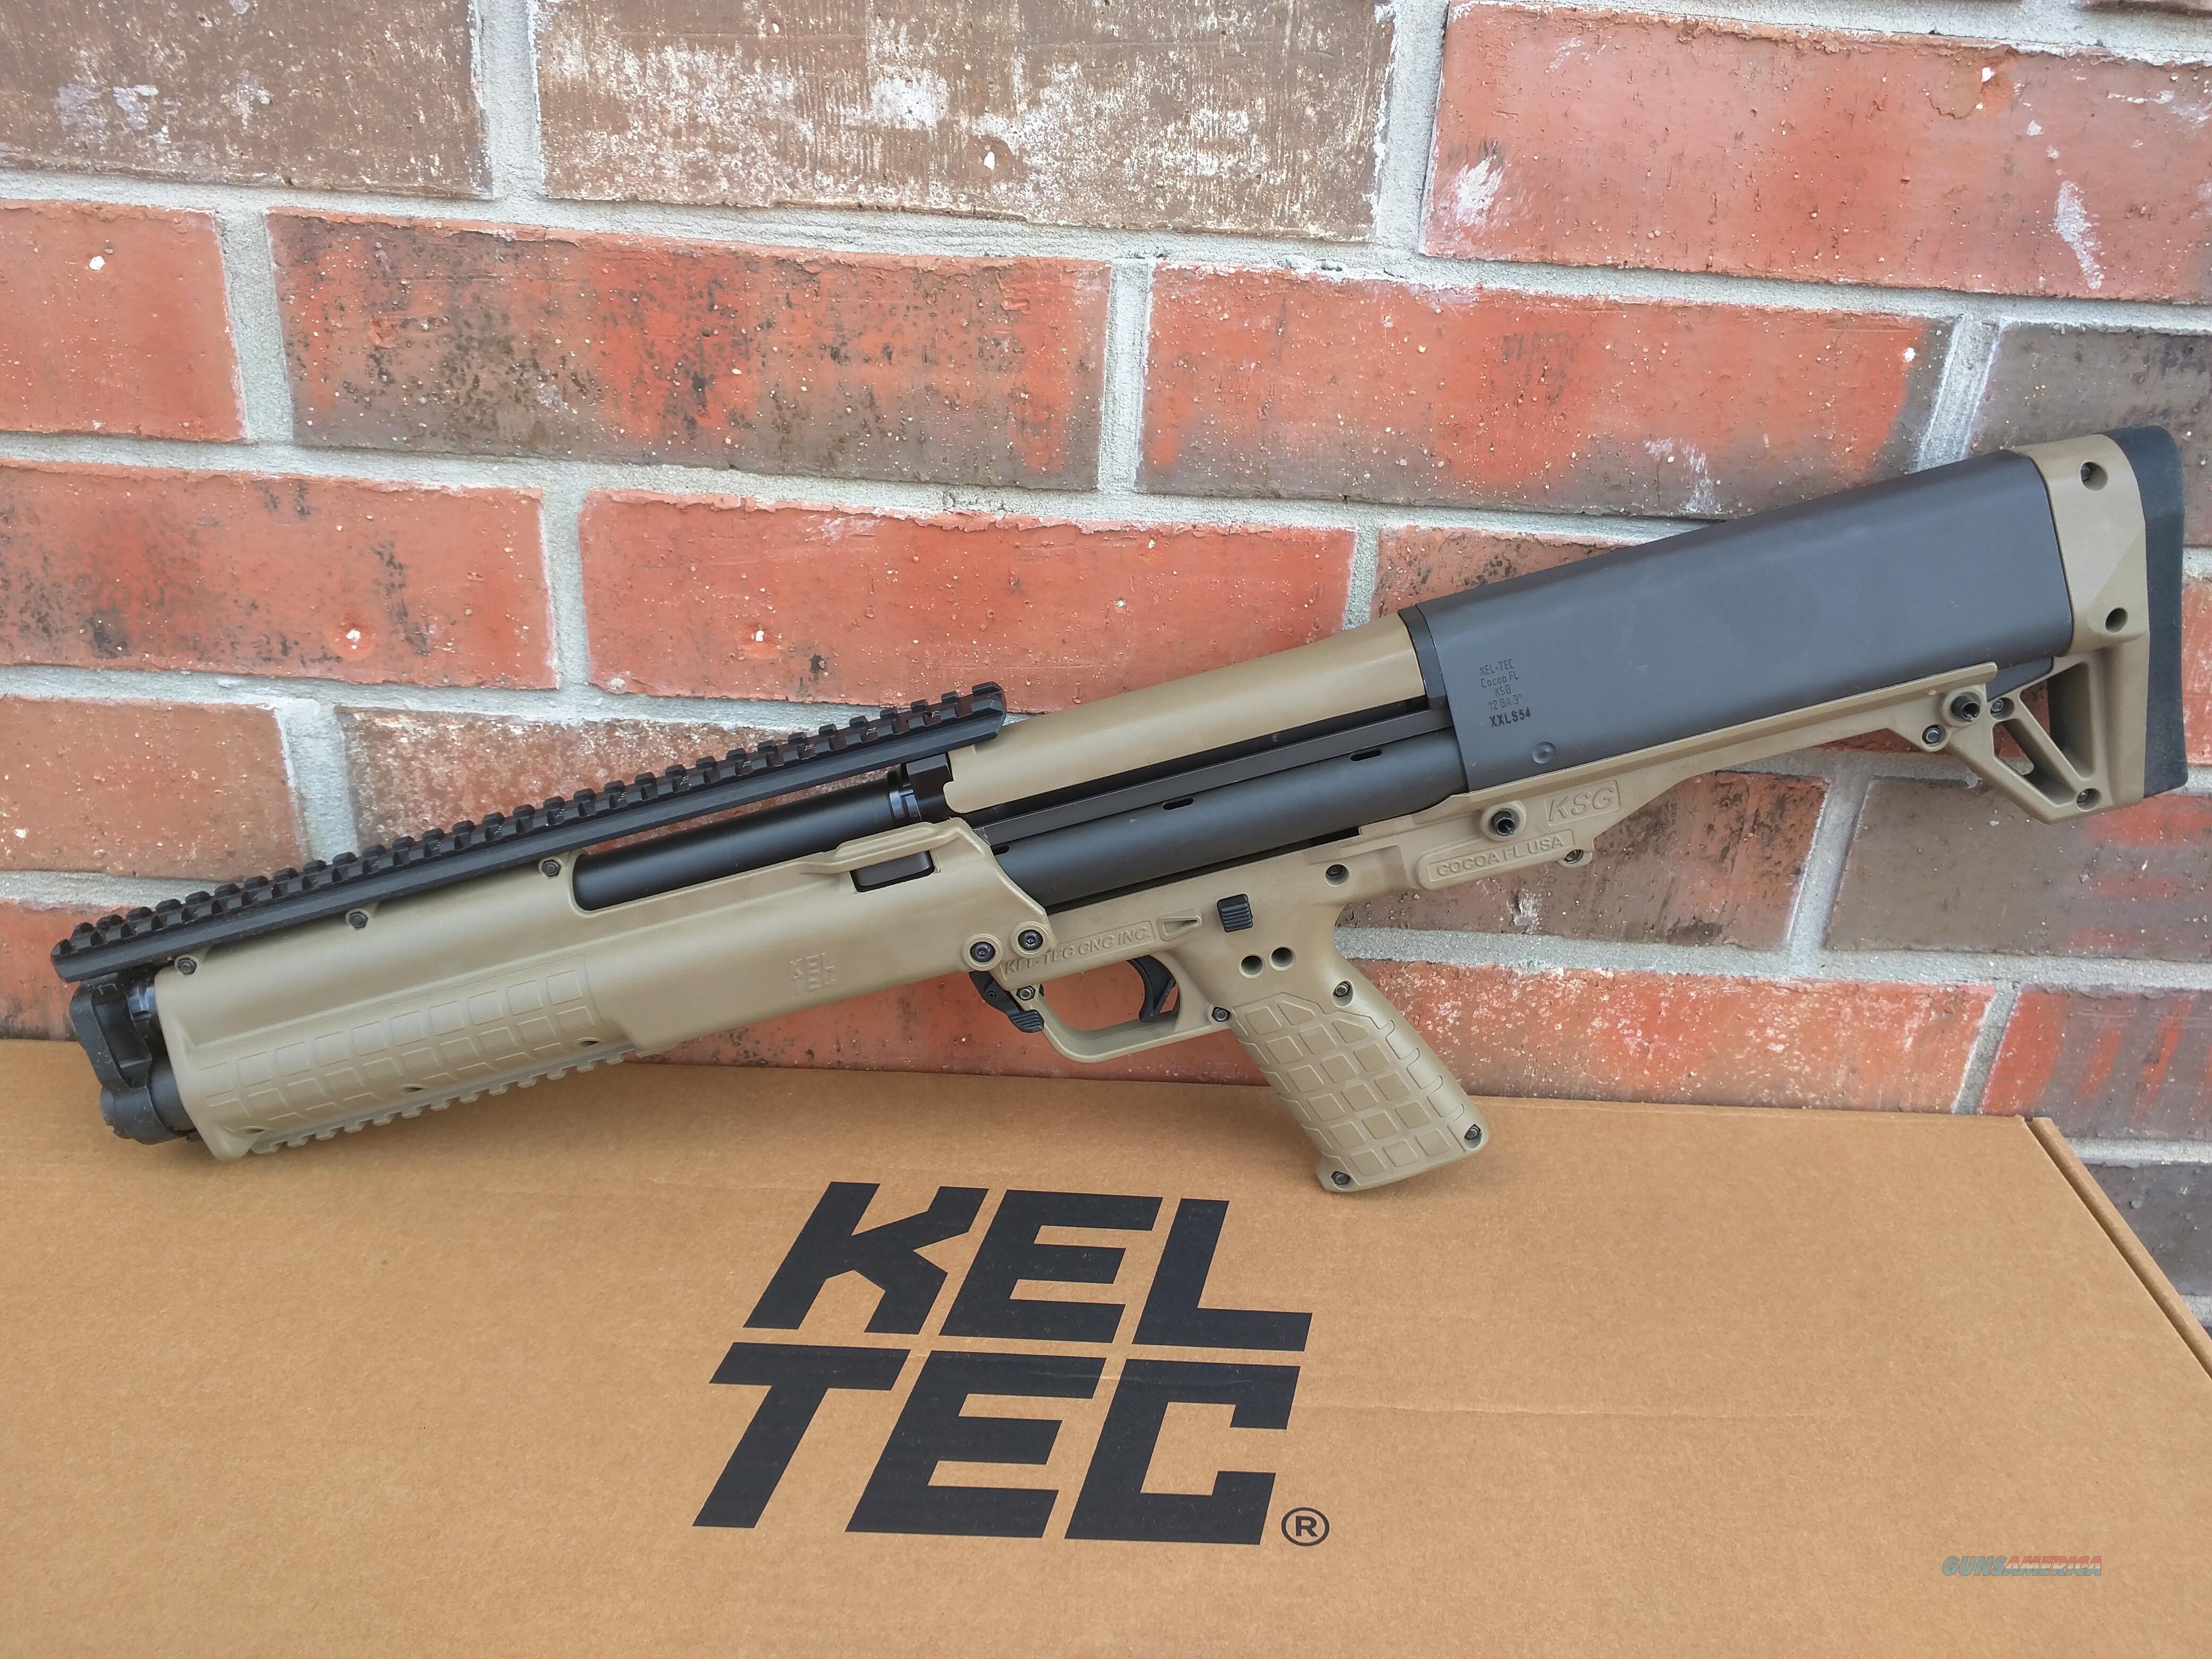 "Keltec KSG Tan 12 Gauge Pump 18.5"" 14+1 Capacity FREE LAYAWAY!! SALE!!  Guns > Shotguns > Kel-Tec Shotguns > KSG"